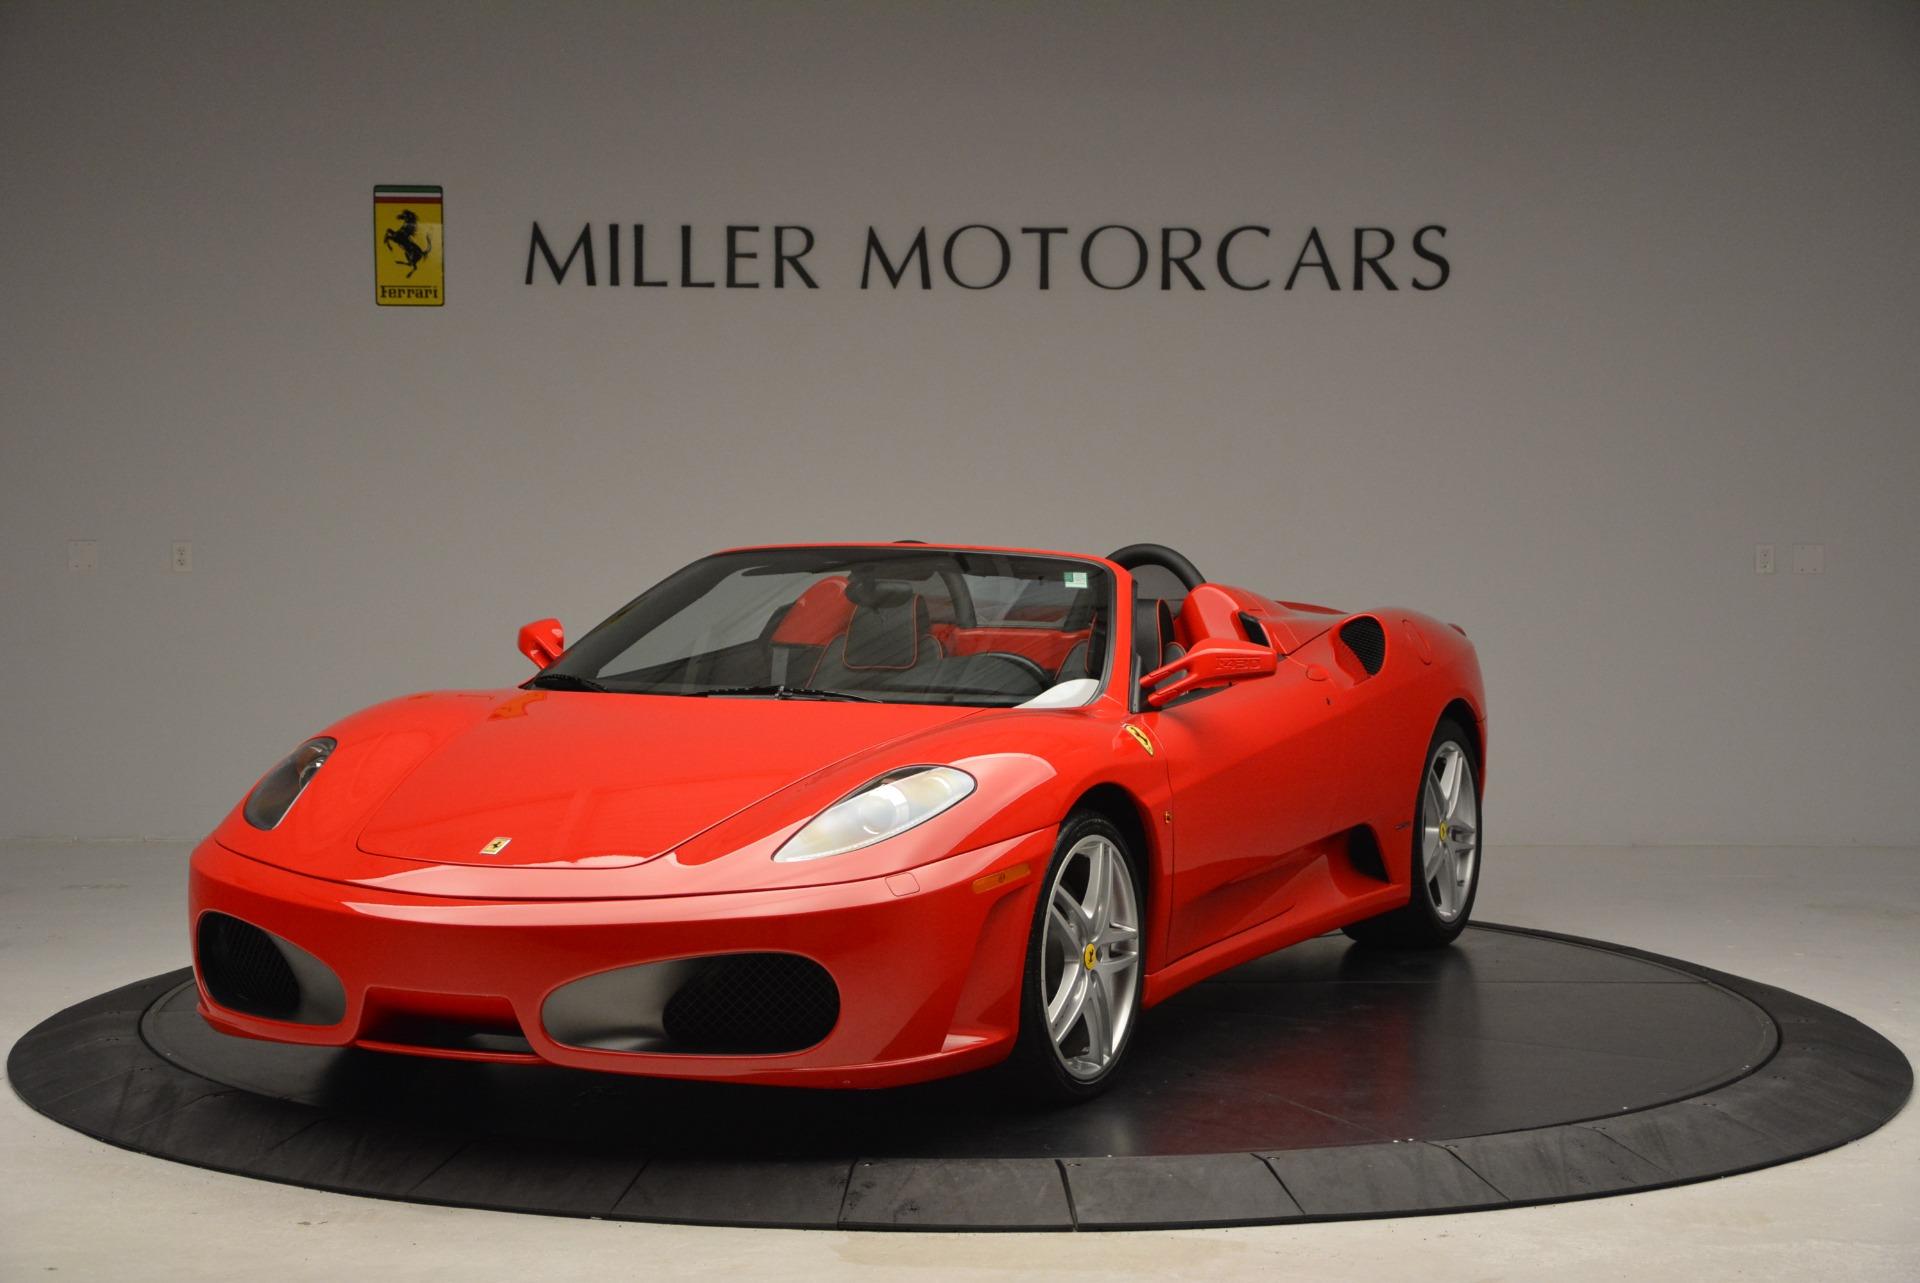 Used 2006 Ferrari F430 SPIDER F1 Spider for sale Sold at Alfa Romeo of Westport in Westport CT 06880 1